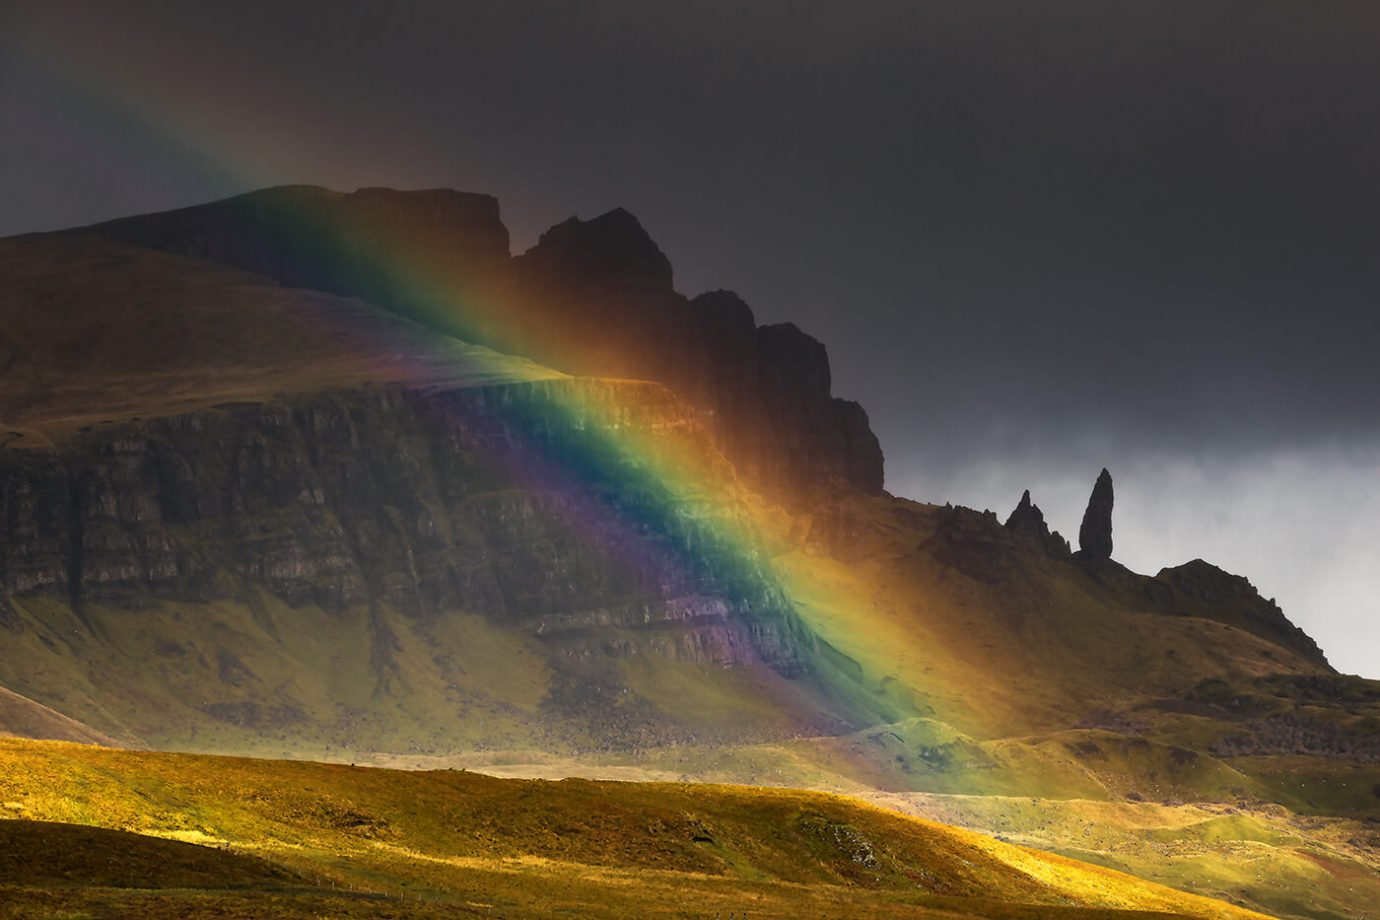 Rainbow, Old Man of Storr, Skye